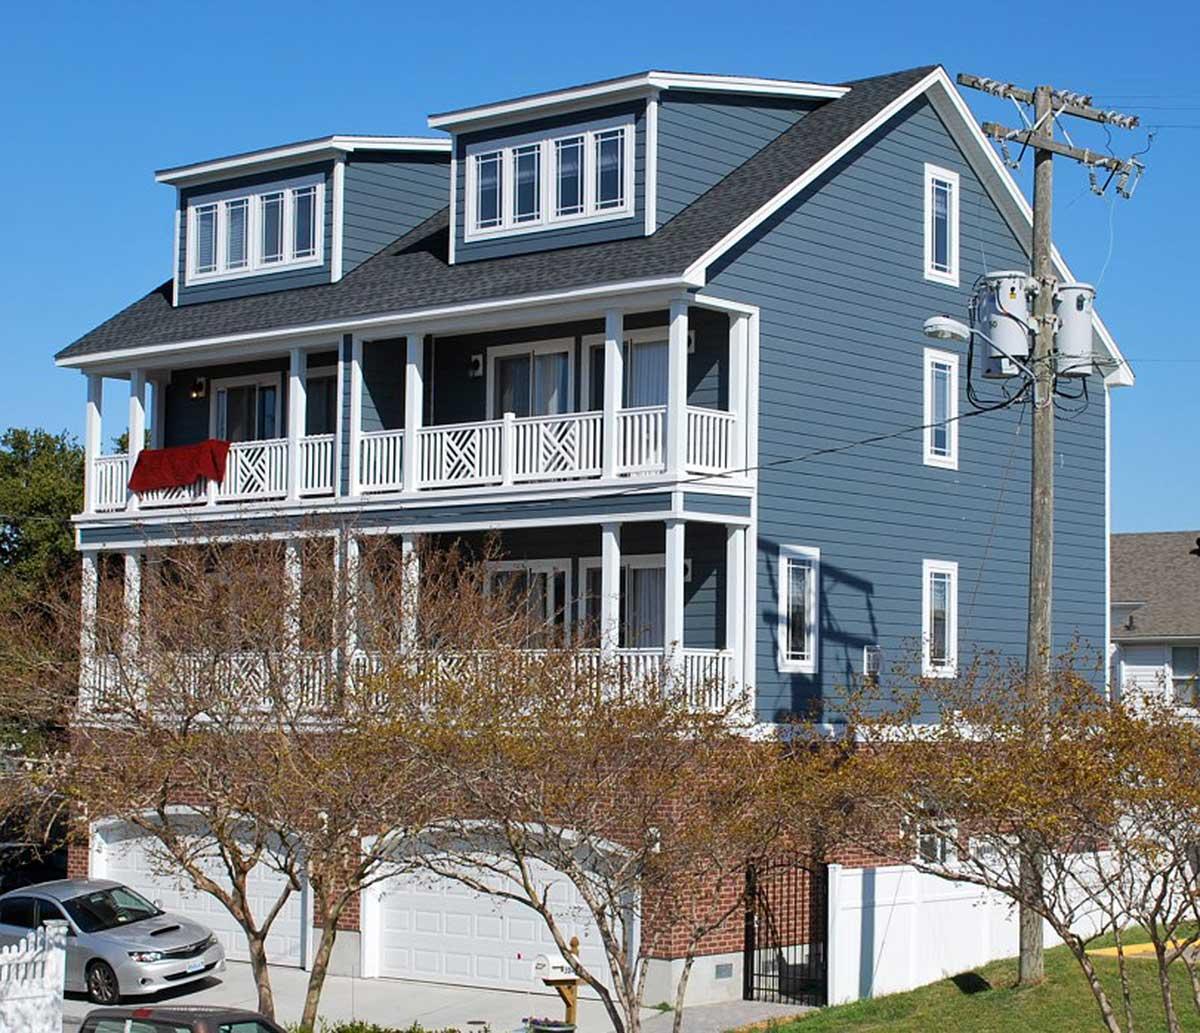 House Plans Duplex Plans Row Home: Coastal Duplex House Plan - 31505GF